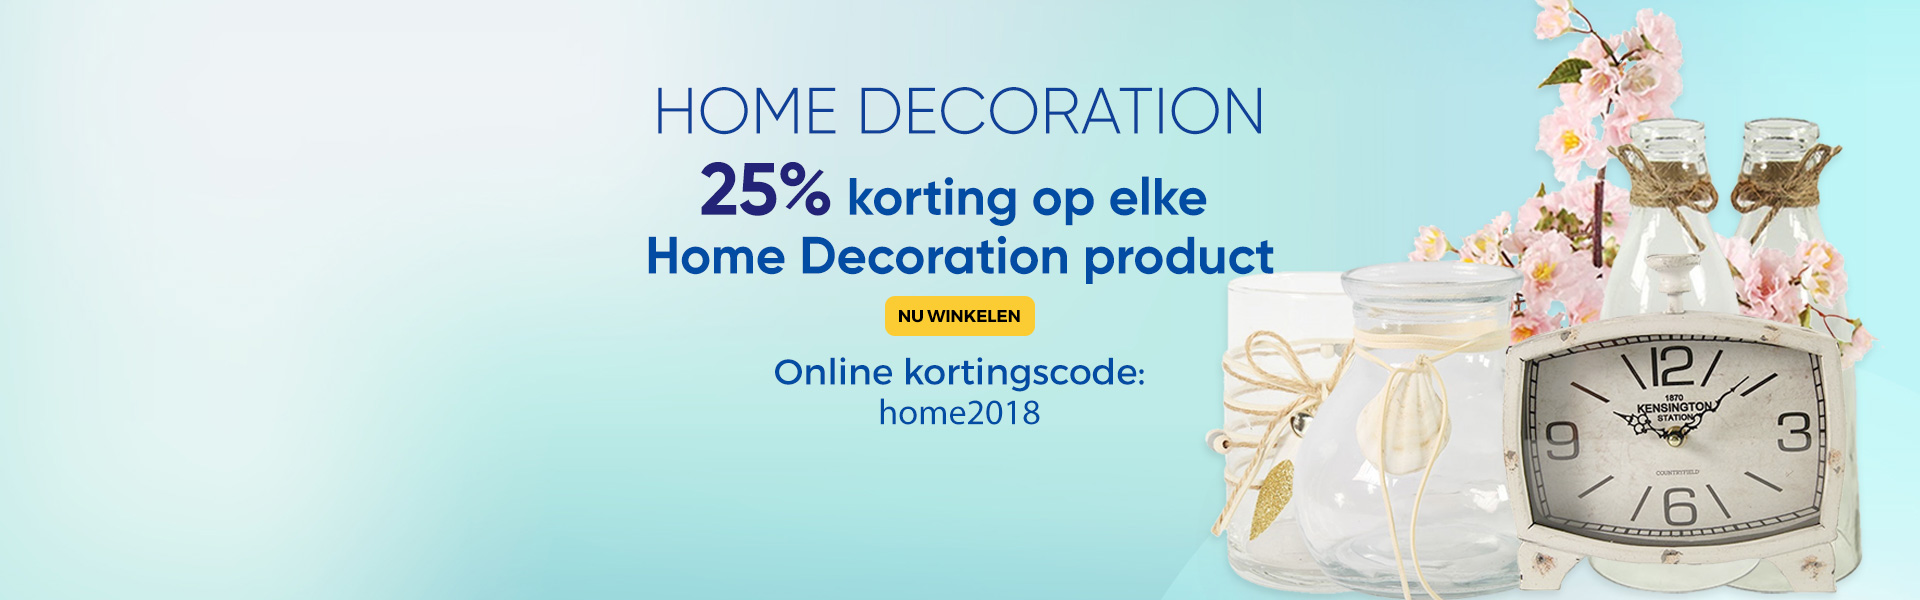 Home Decoration 25% korting